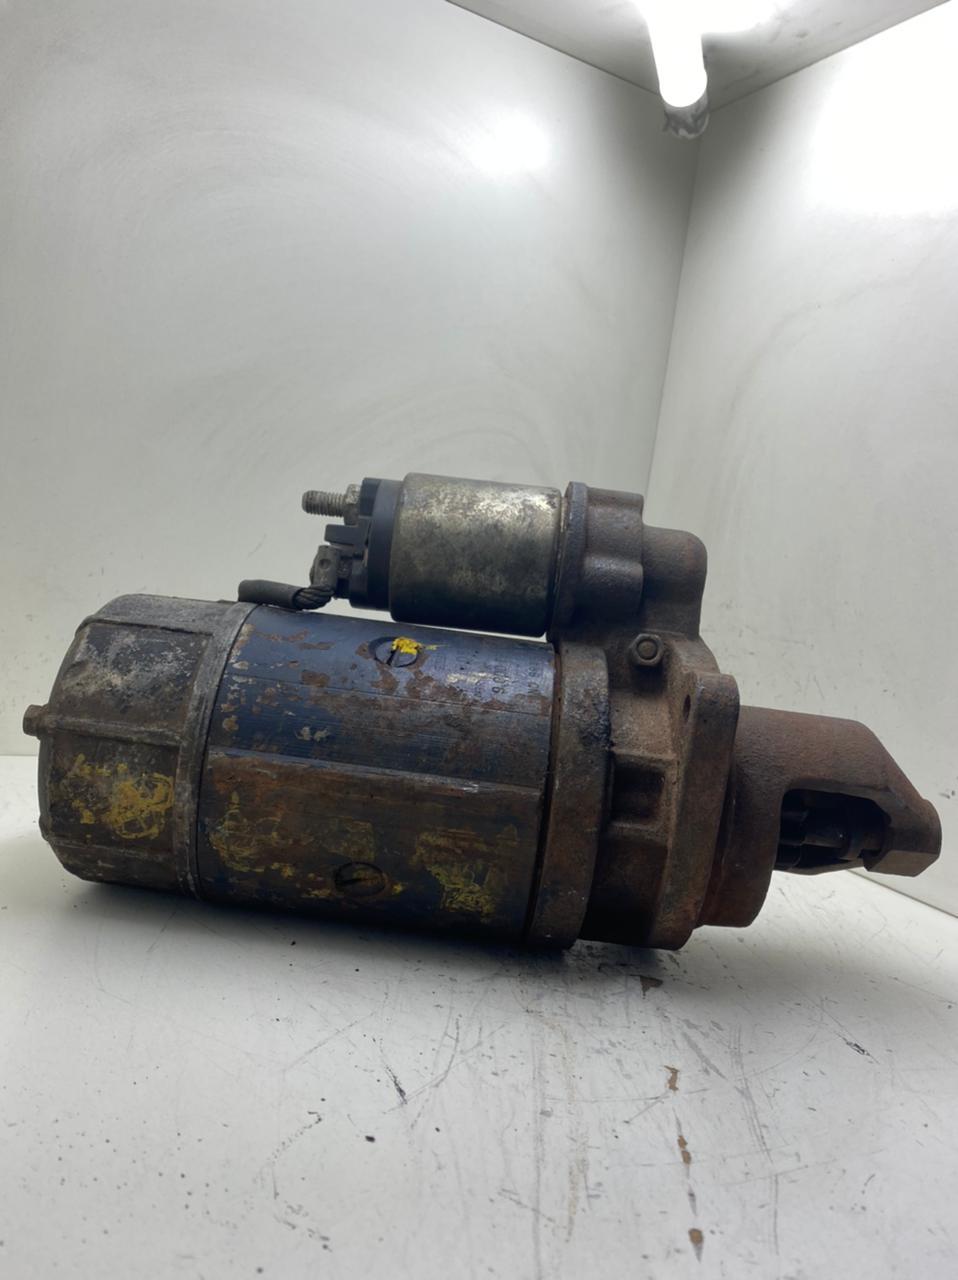 Motor de Arranque AGRALE CASE W20E VW FORD F12000 F14000 BOSCH 12V 10 DENTES 9057201079 TJB911023B 900083077